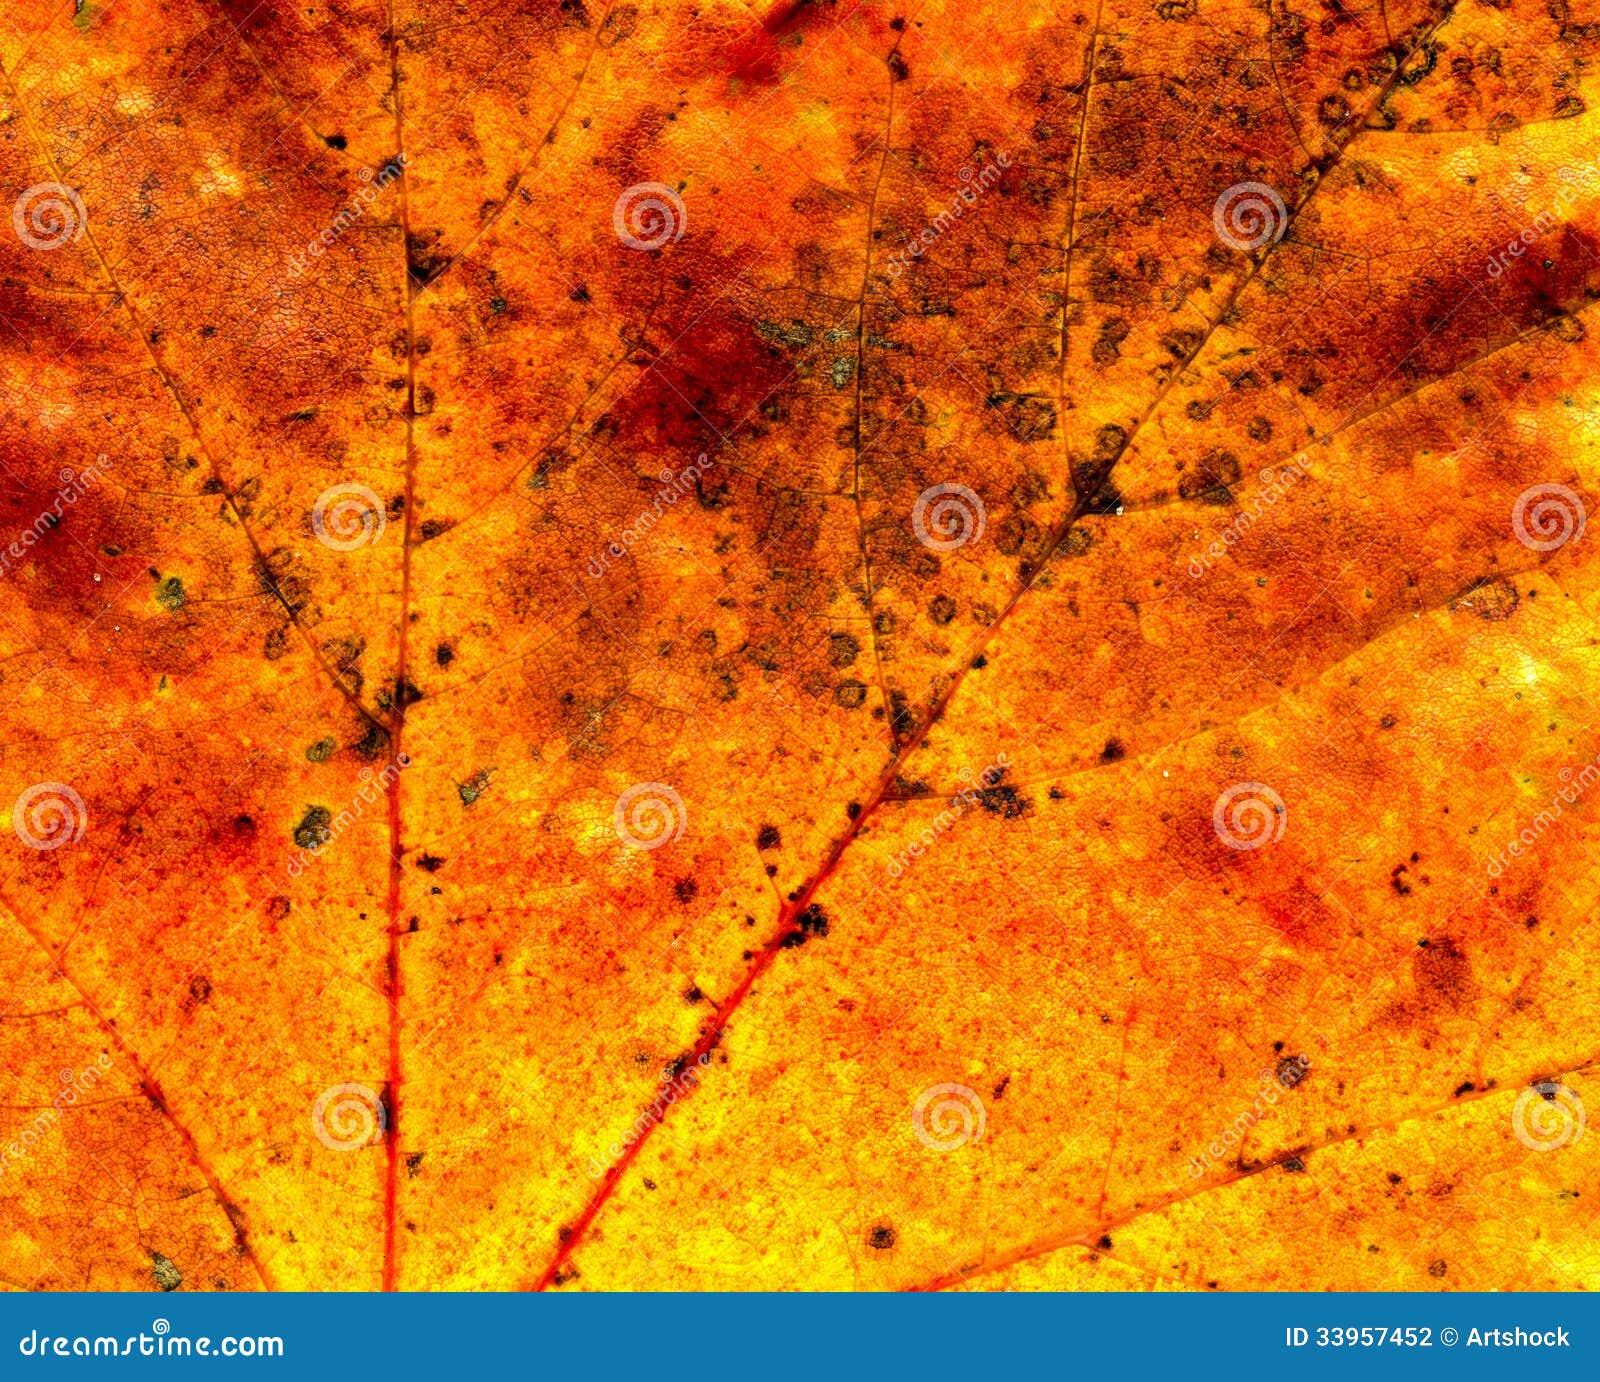 Fall maple leaf texture